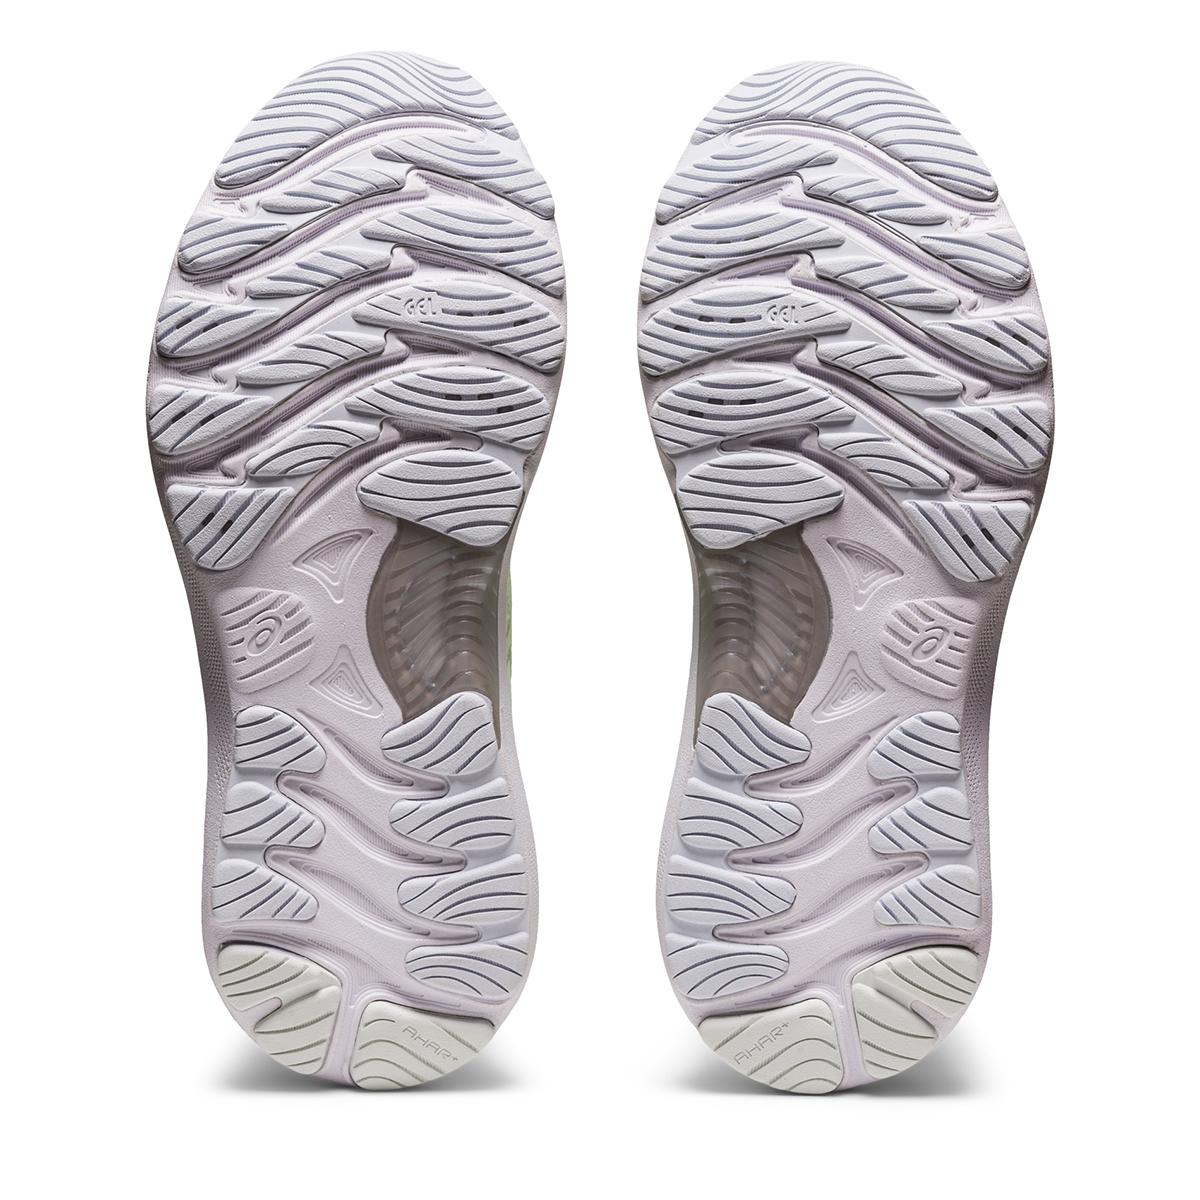 Women's Asics Gel-Nimbus 23 Running Shoe - Color: Illuminate Yellow - Size: 5 - Width: Regular, Illuminate Yellow, large, image 6